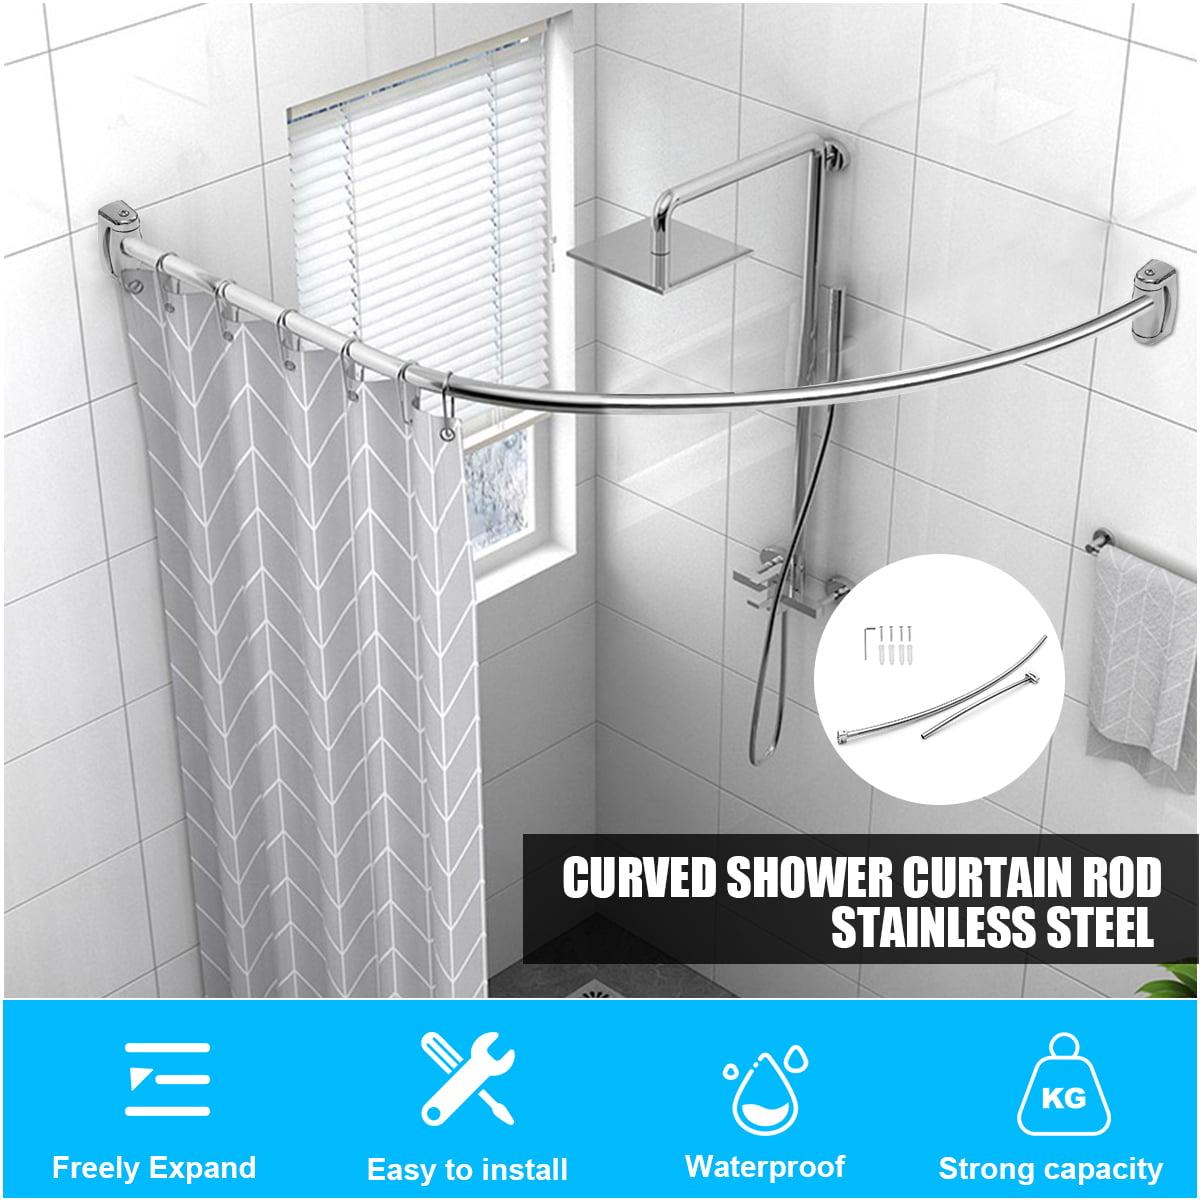 Adjustable Curved Shower Curtain Rod Stainless Steel Telescopic Pole Bathroom Decor Easy To Install Walmart Com Walmart Com